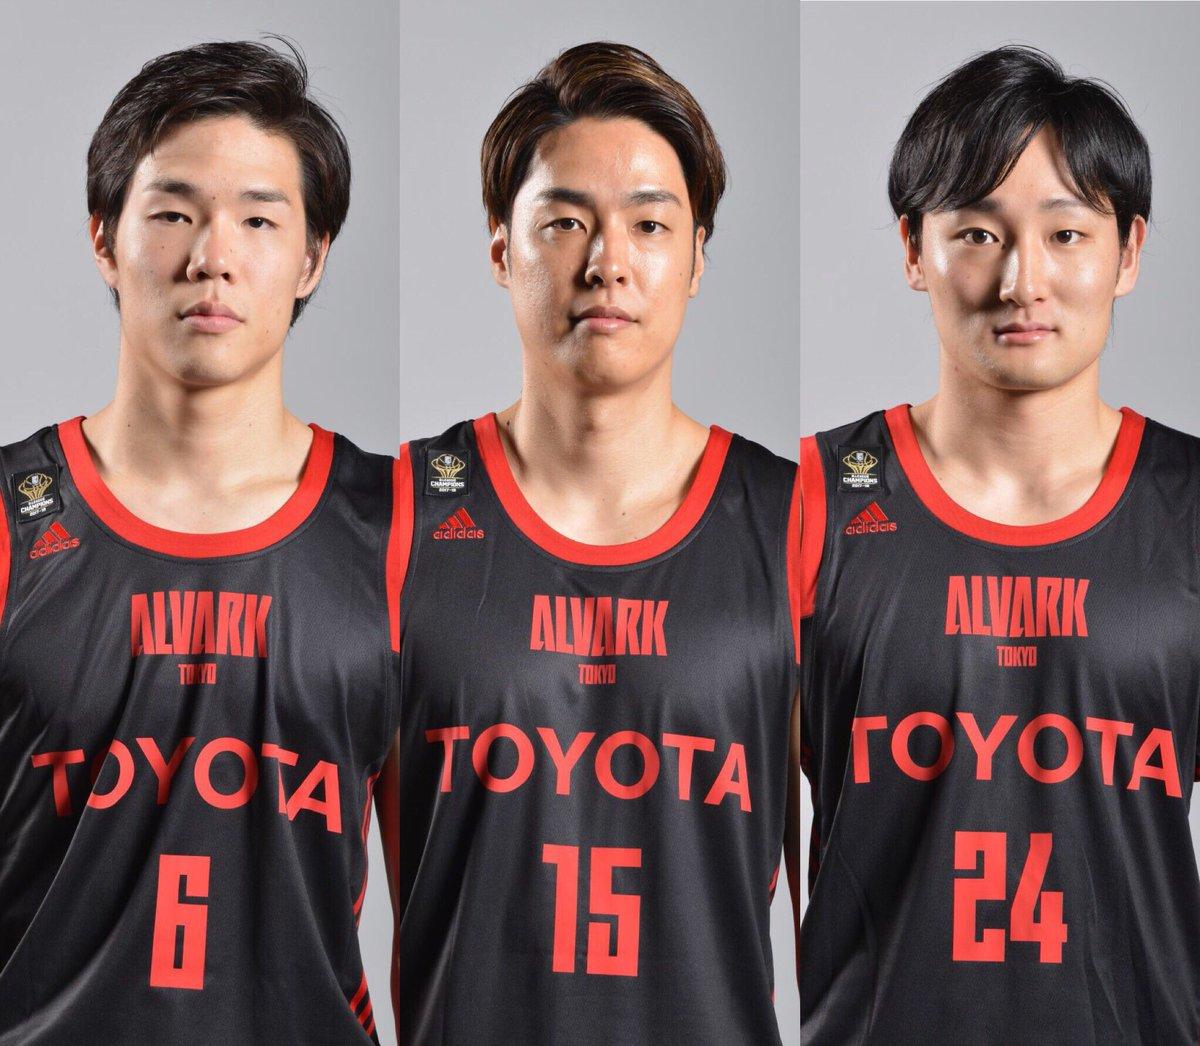 test ツイッターメディア - 🇯🇵お知らせ🇯🇵 11/30(金)、12/3(月)に富山市で開催される「#FIBA バスケットボールワールドカップ2019 アジア地区2次予選 Window5」に向けた日本代表第6次強化合宿のメンバーとして#6 馬場選手、#15 竹内選手、#24 田中選手の3名が選出されました‼️ #アルバルク東京  #AkatsukiFive #JBA #FIBAWC https://t.co/u6ZH5bSlM7